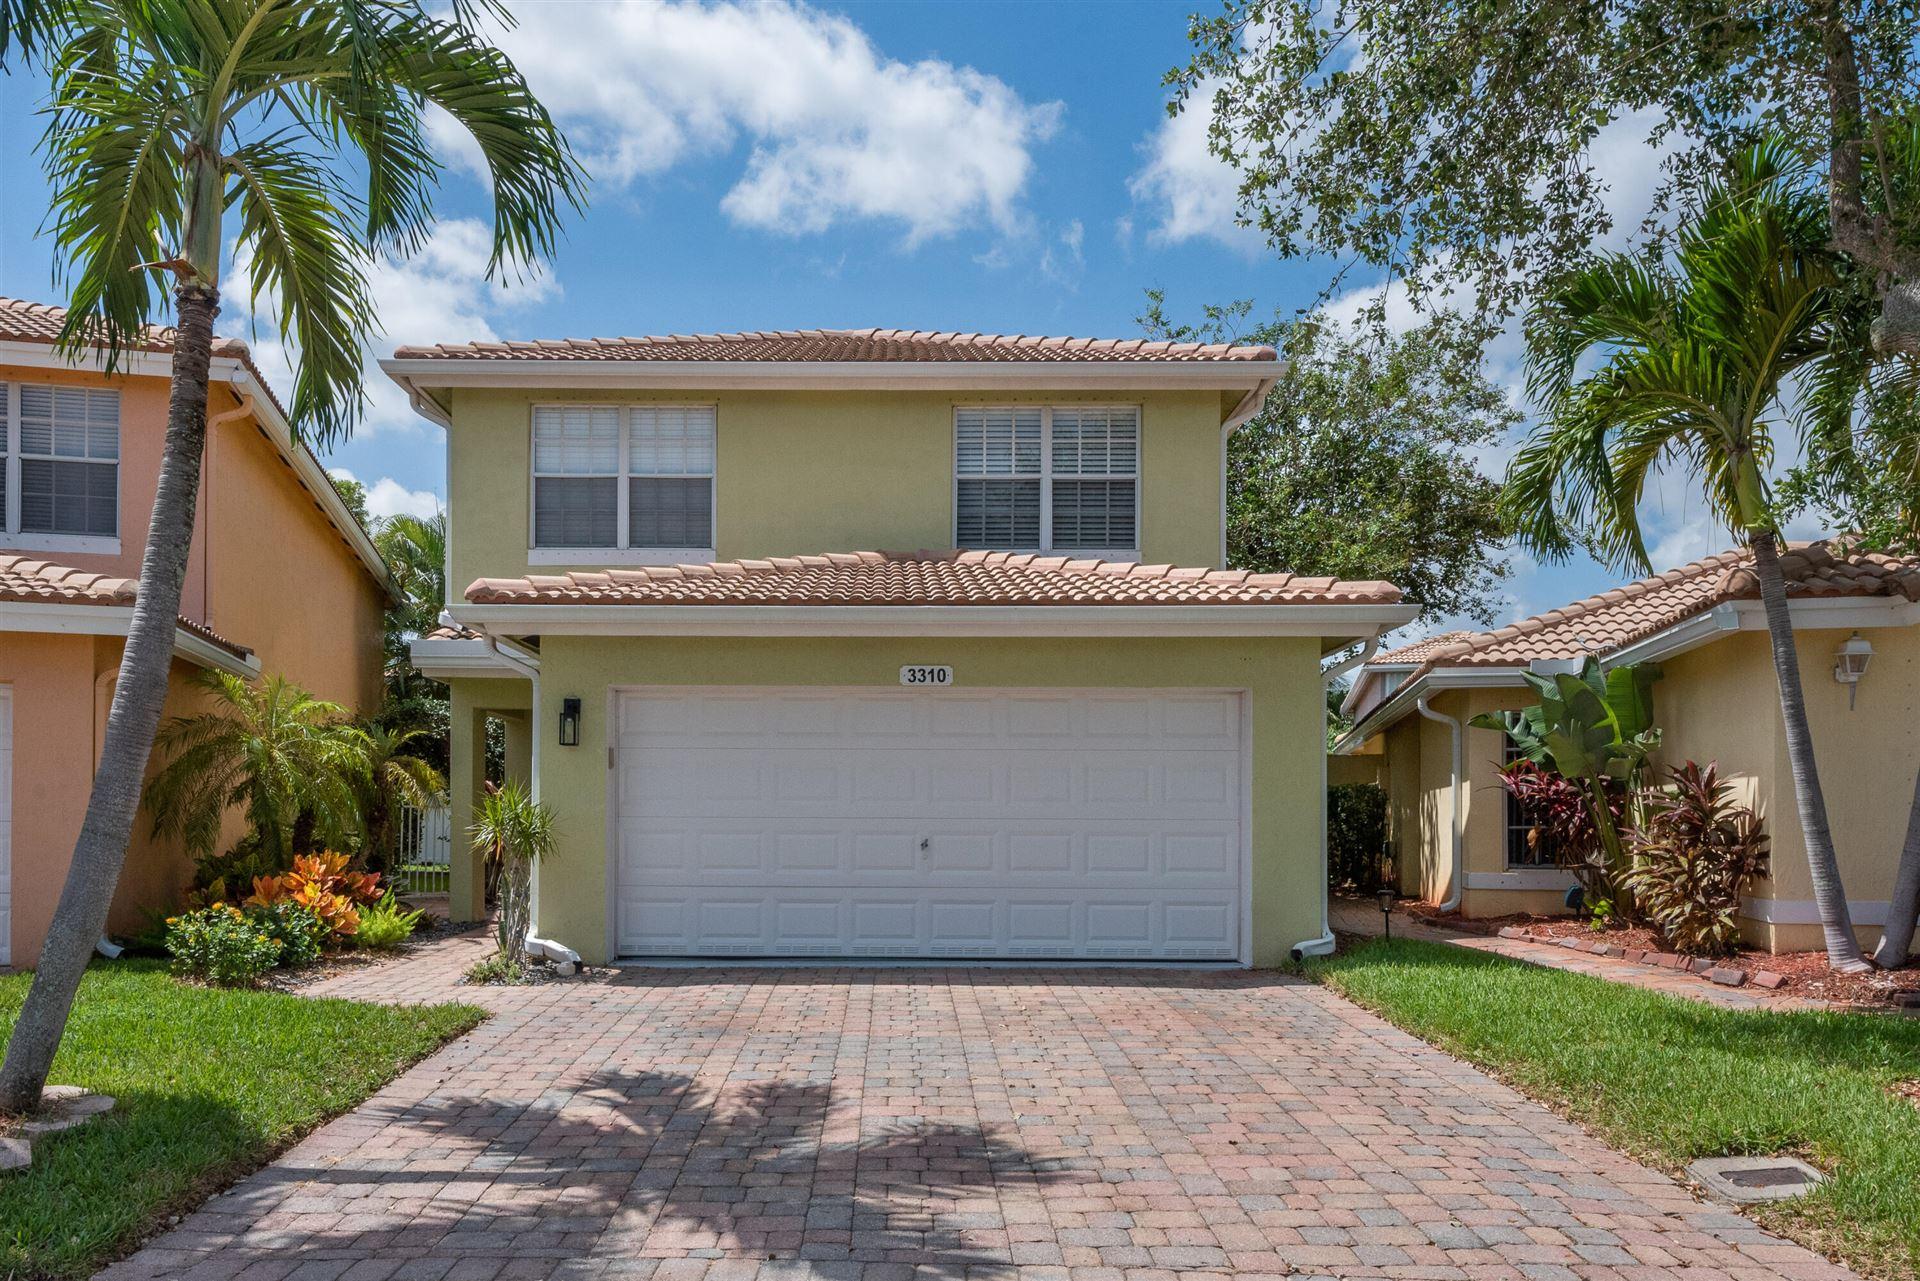 3310 Blue Fin Drive, West Palm Beach, FL 33411 - MLS#: RX-10743665